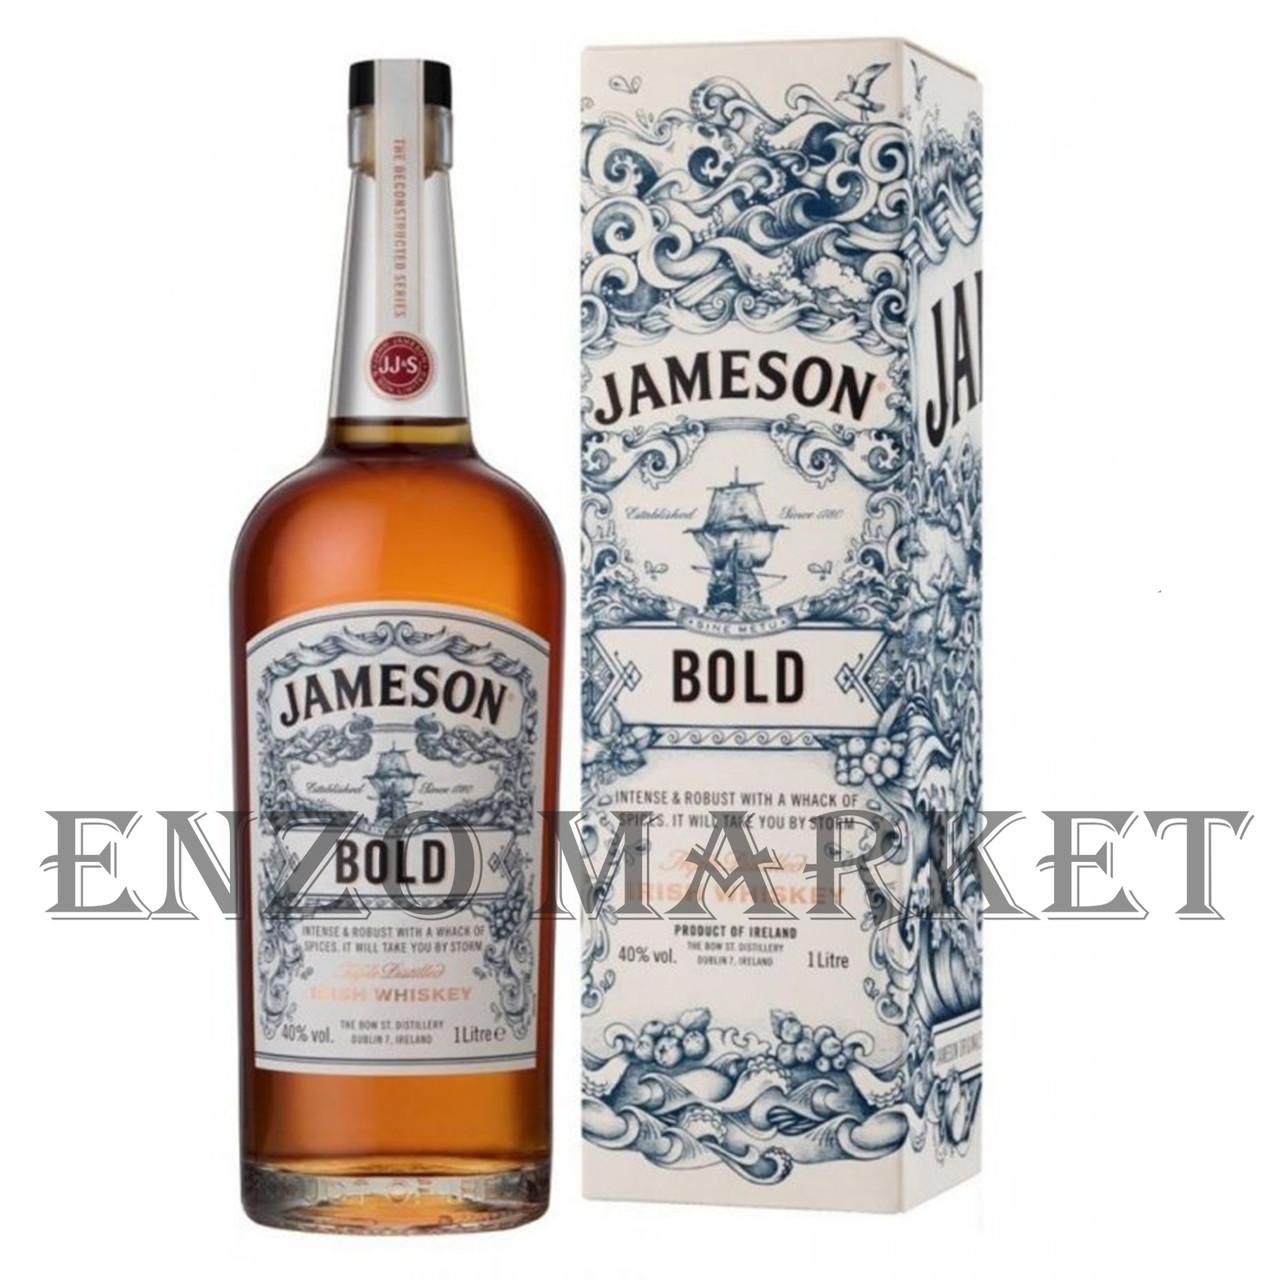 Виски John Jameson Deconstructed Series BOLD (Джон Джеймсон Деконструктед Сериес БОЛД) 40%, 1 литра